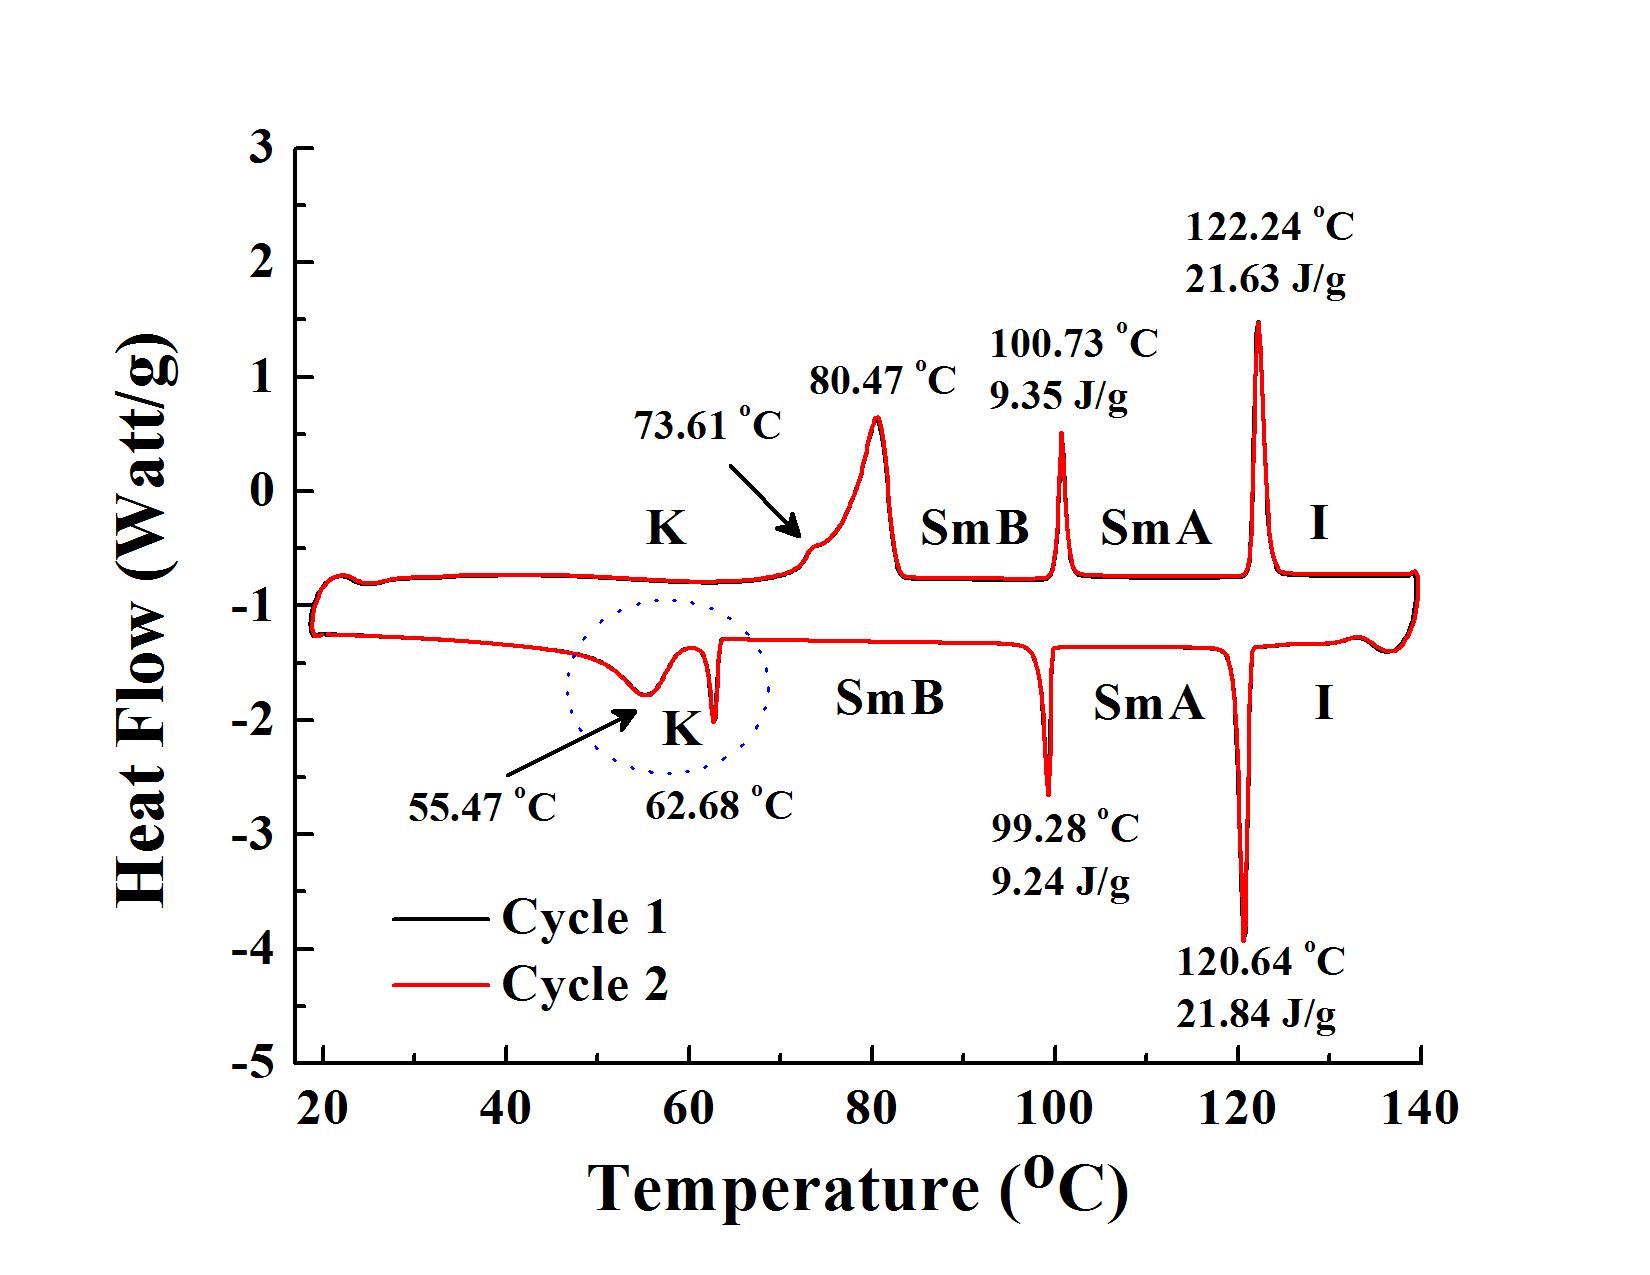 hight resolution of dsc 2cycles jpg517 08 kb phase behavior